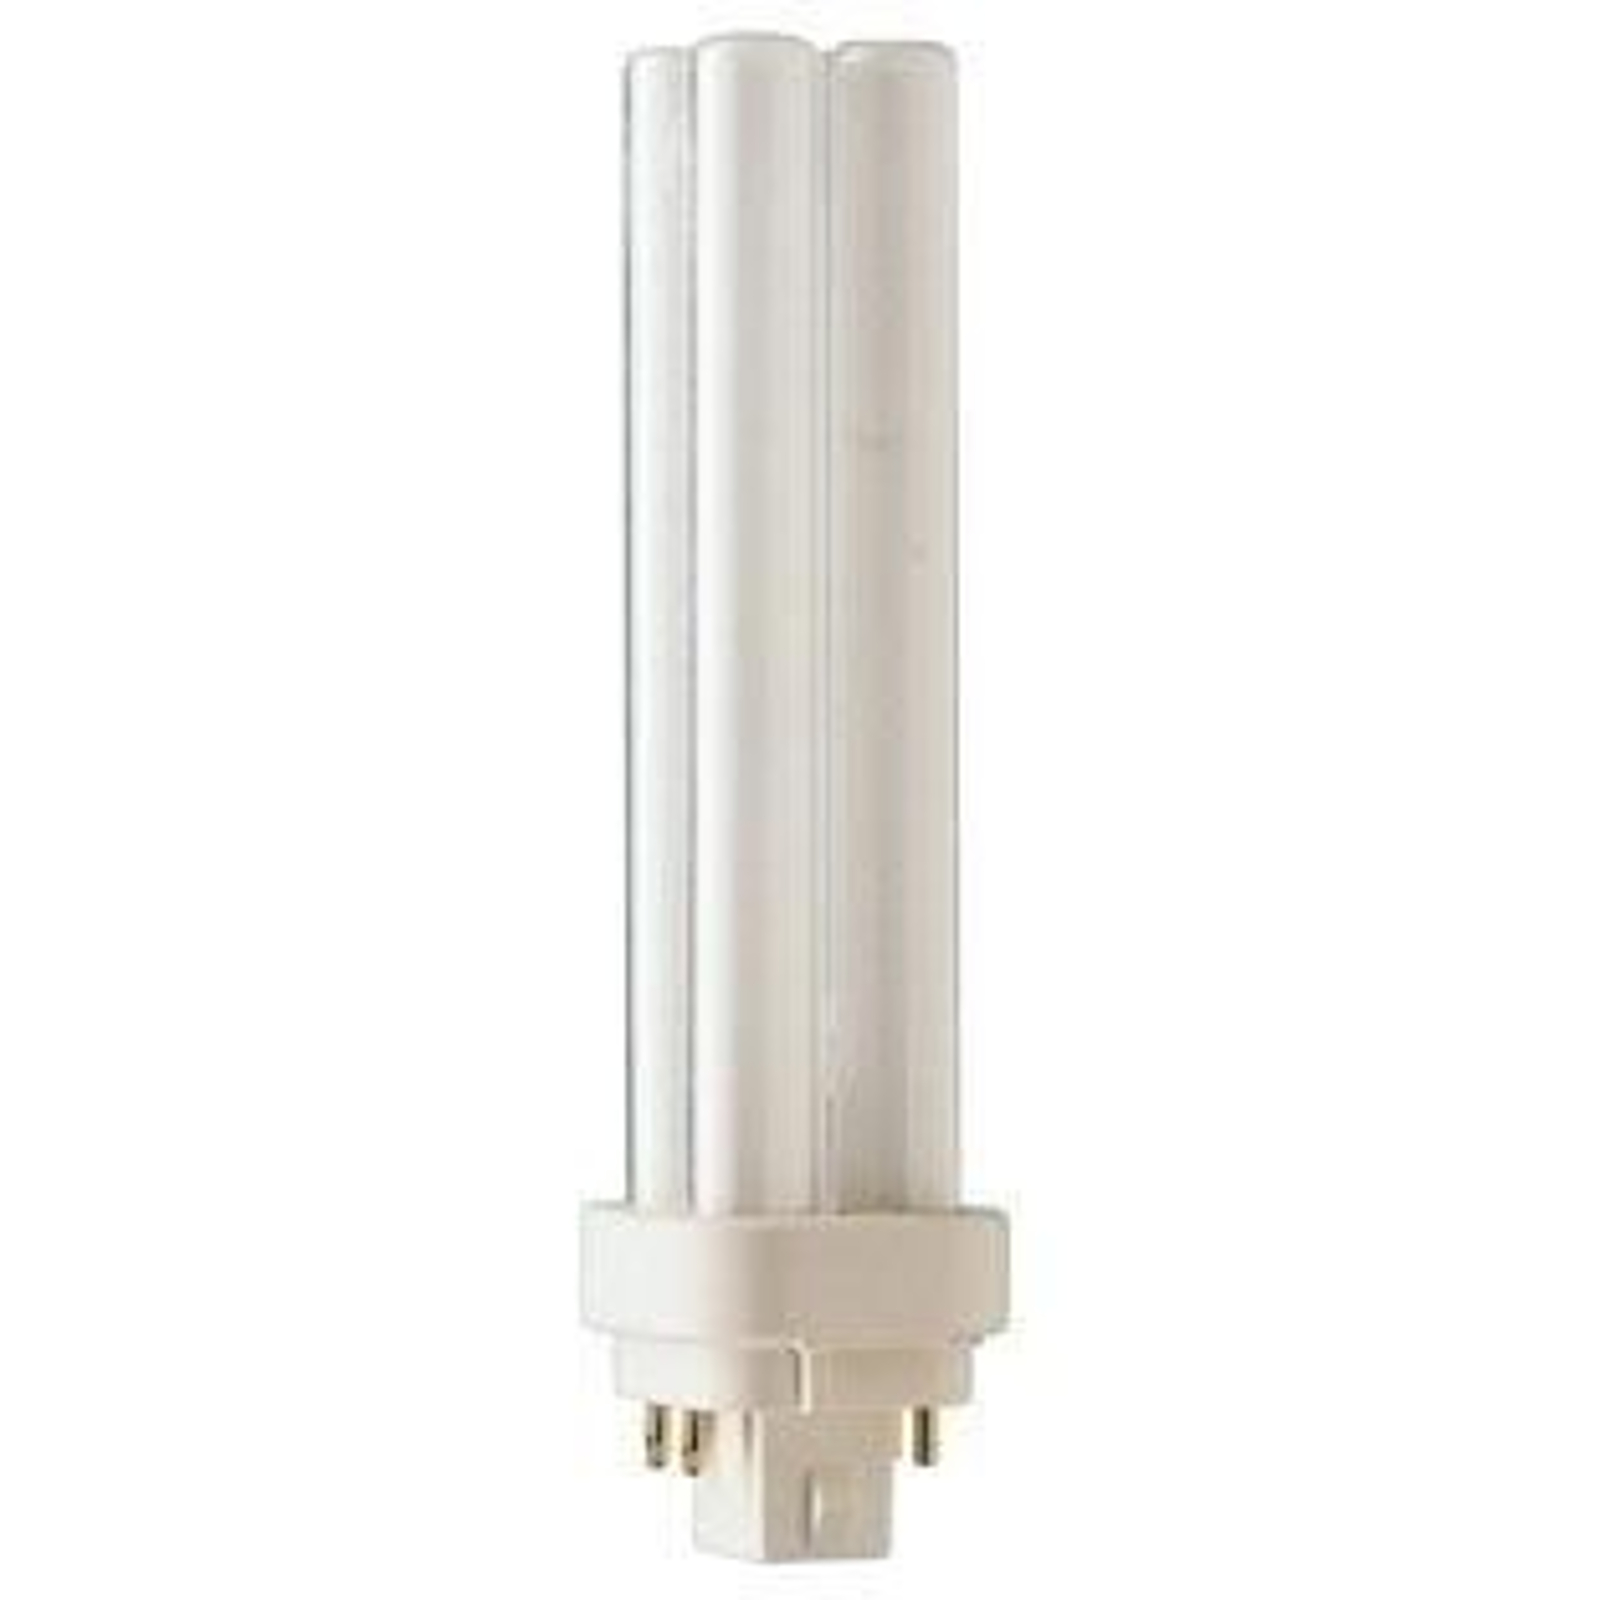 G24q 10W 840 Kompaktleuchtstofflampe DULUX D/E